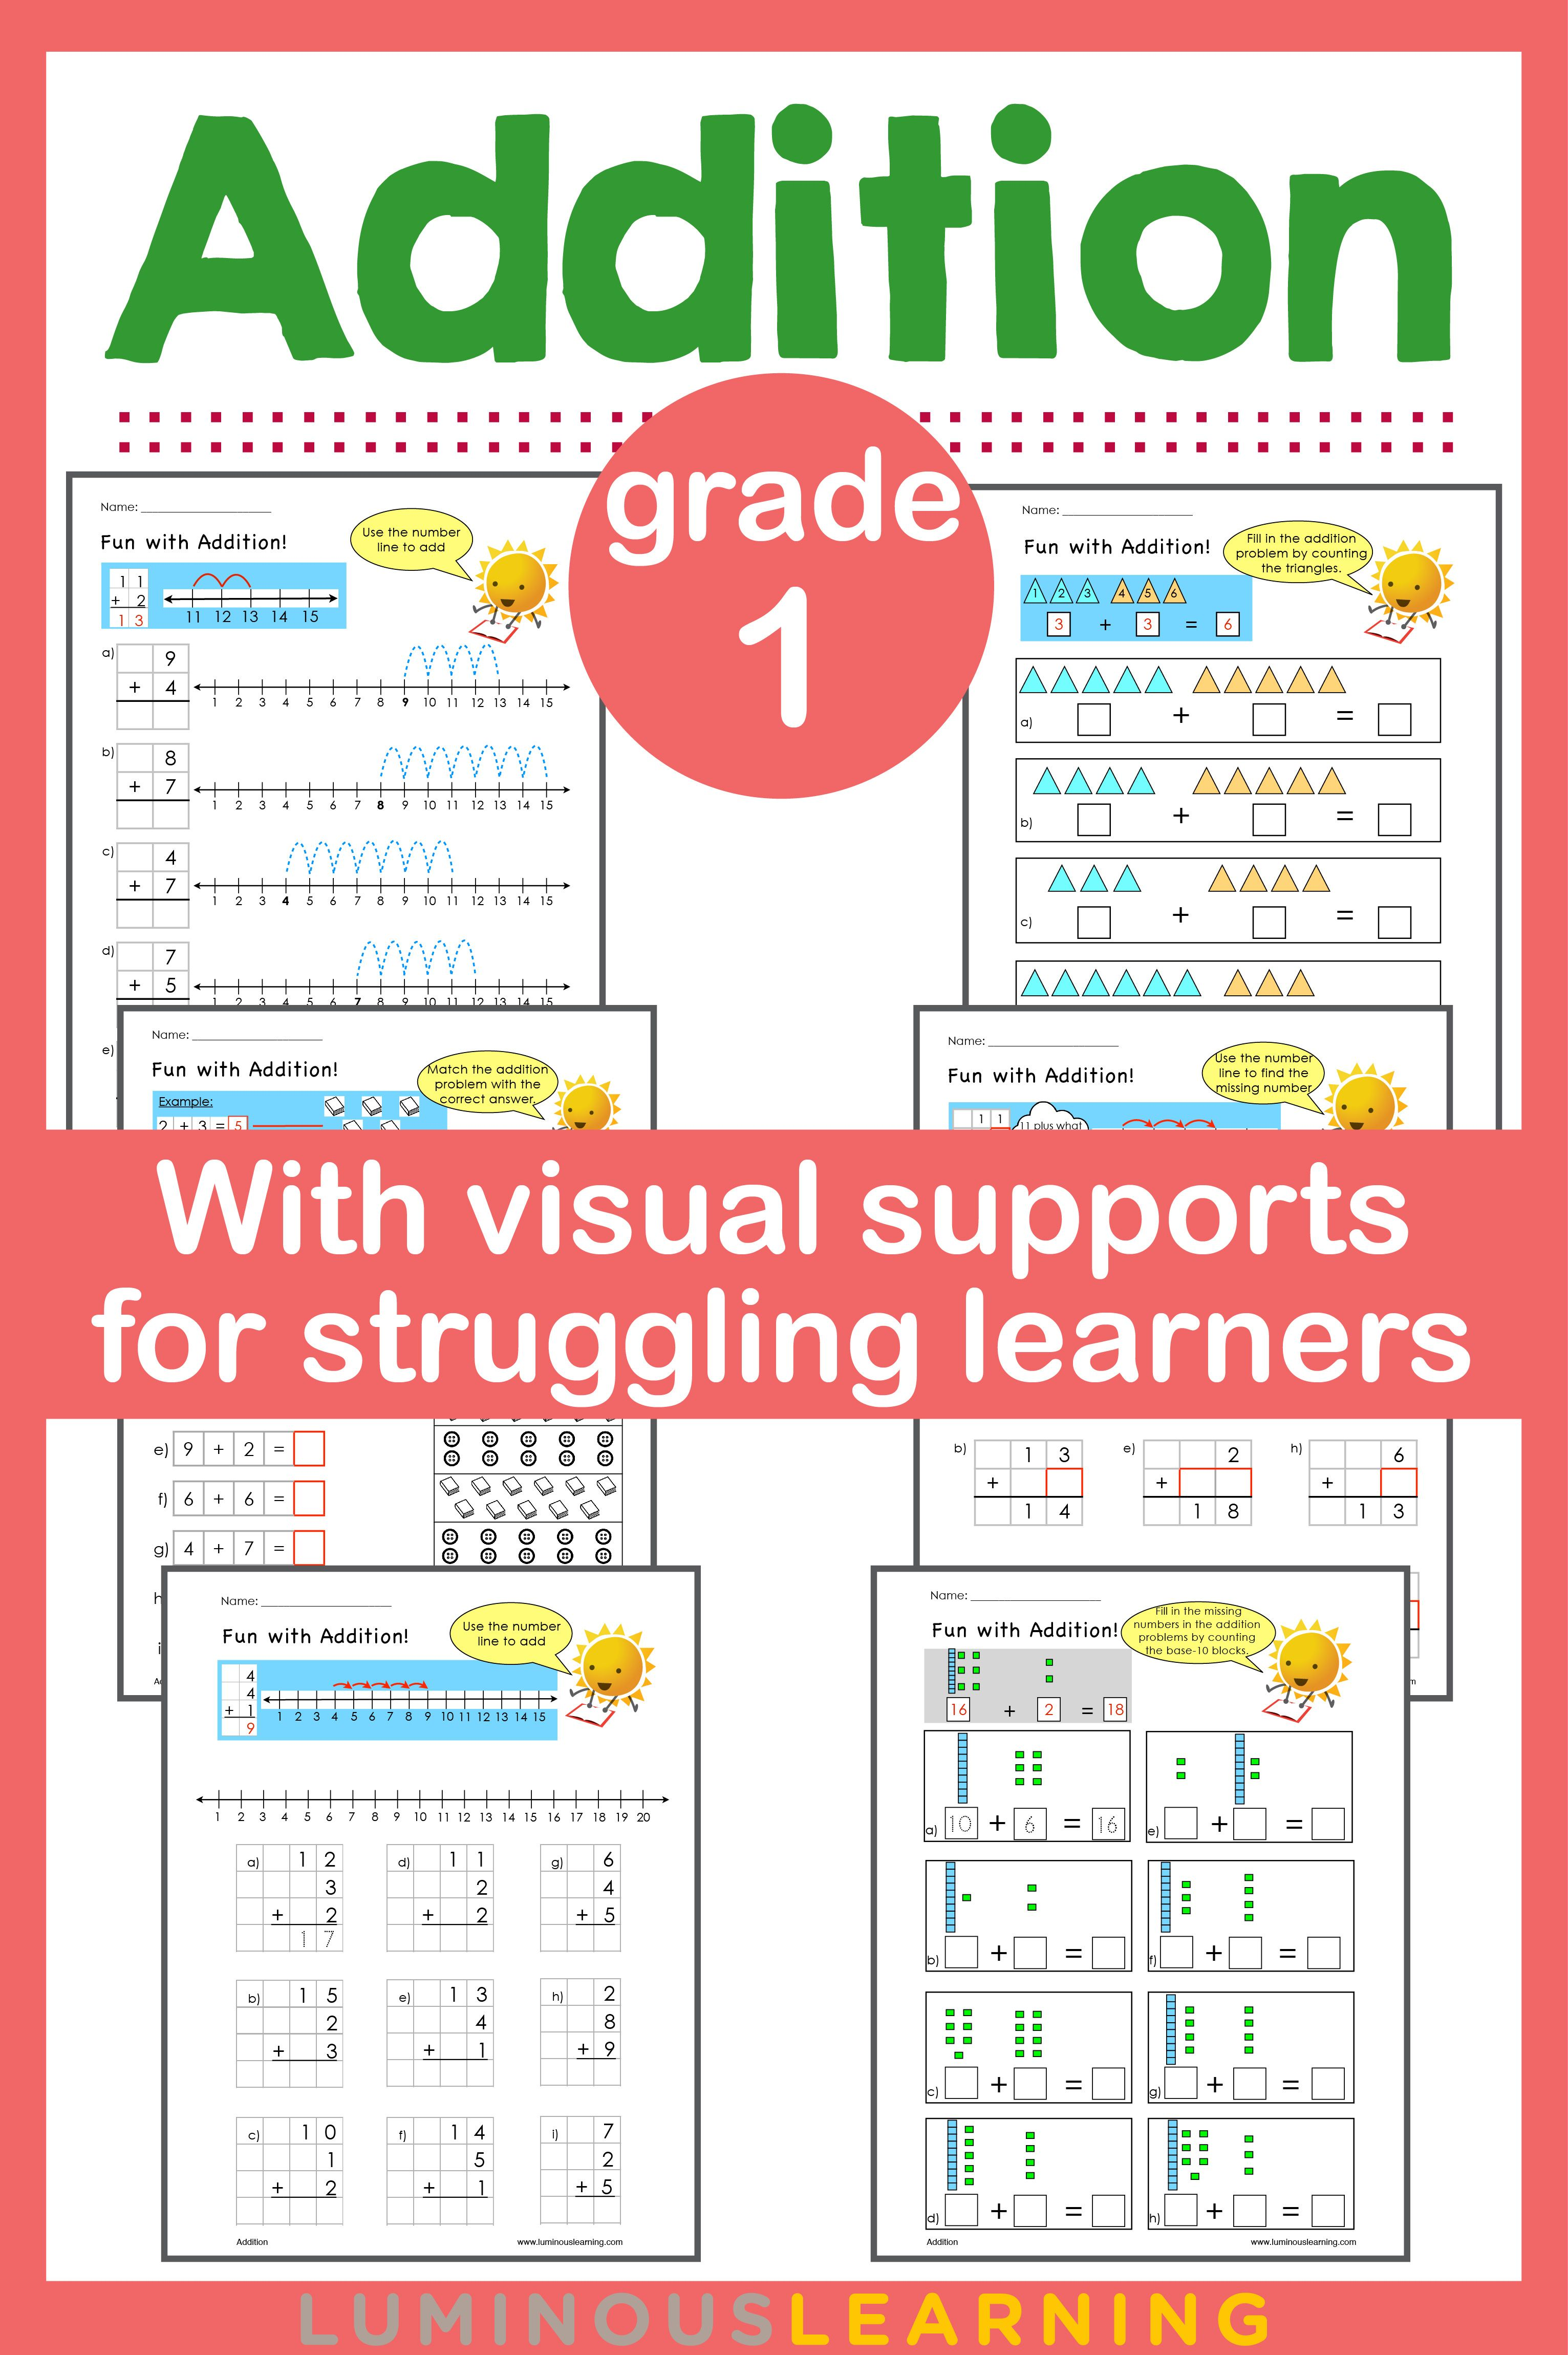 Grade 1 Addition Workbook: Making Math Visual | Math skills, Math ...